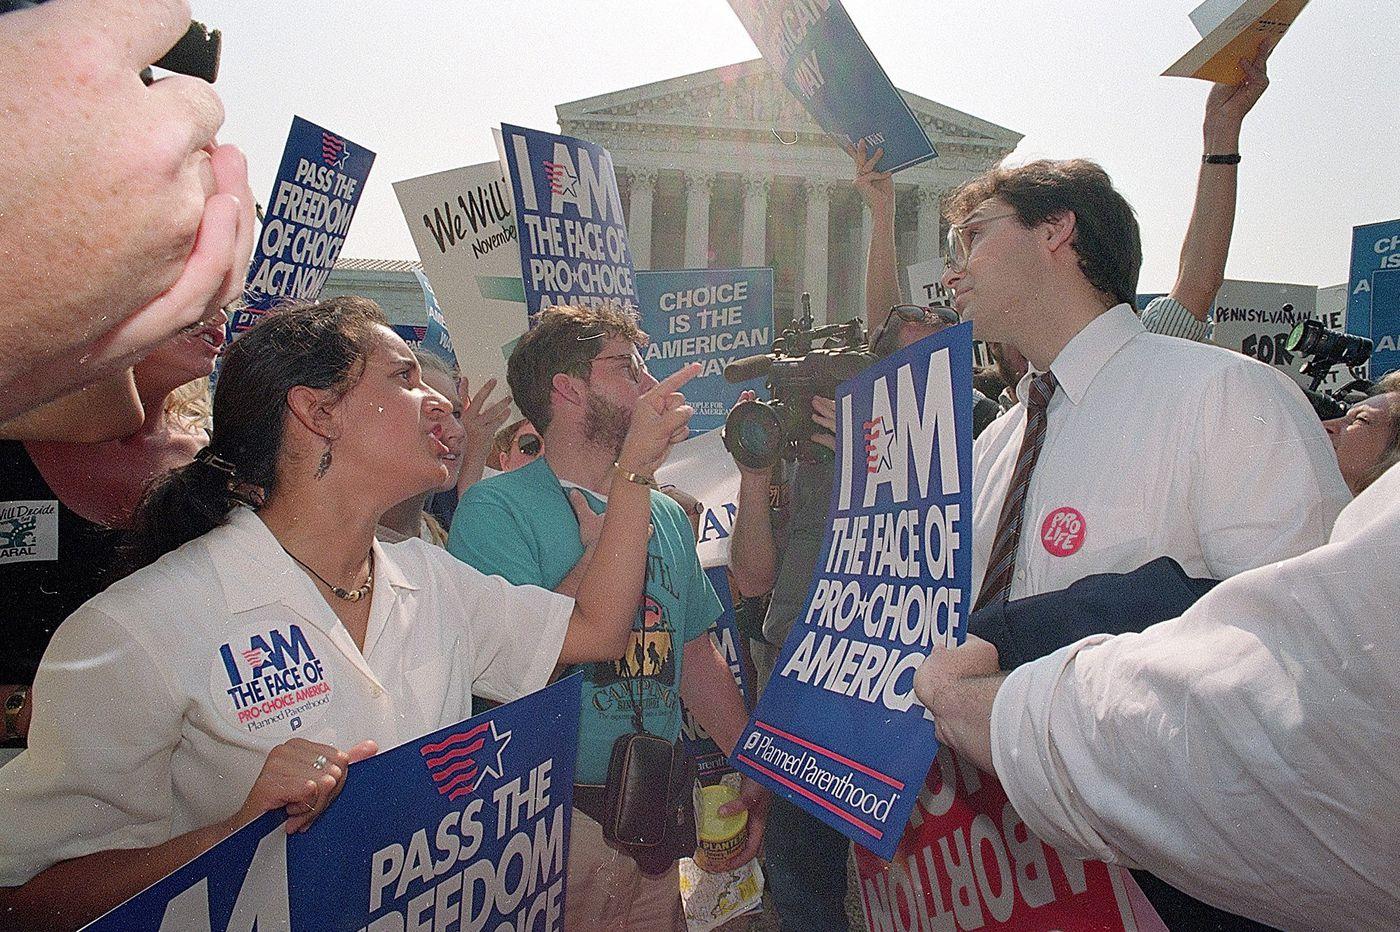 Pro/Con: Should SCOTUS overturn Roe, the landmark abortion decision? | Opinion